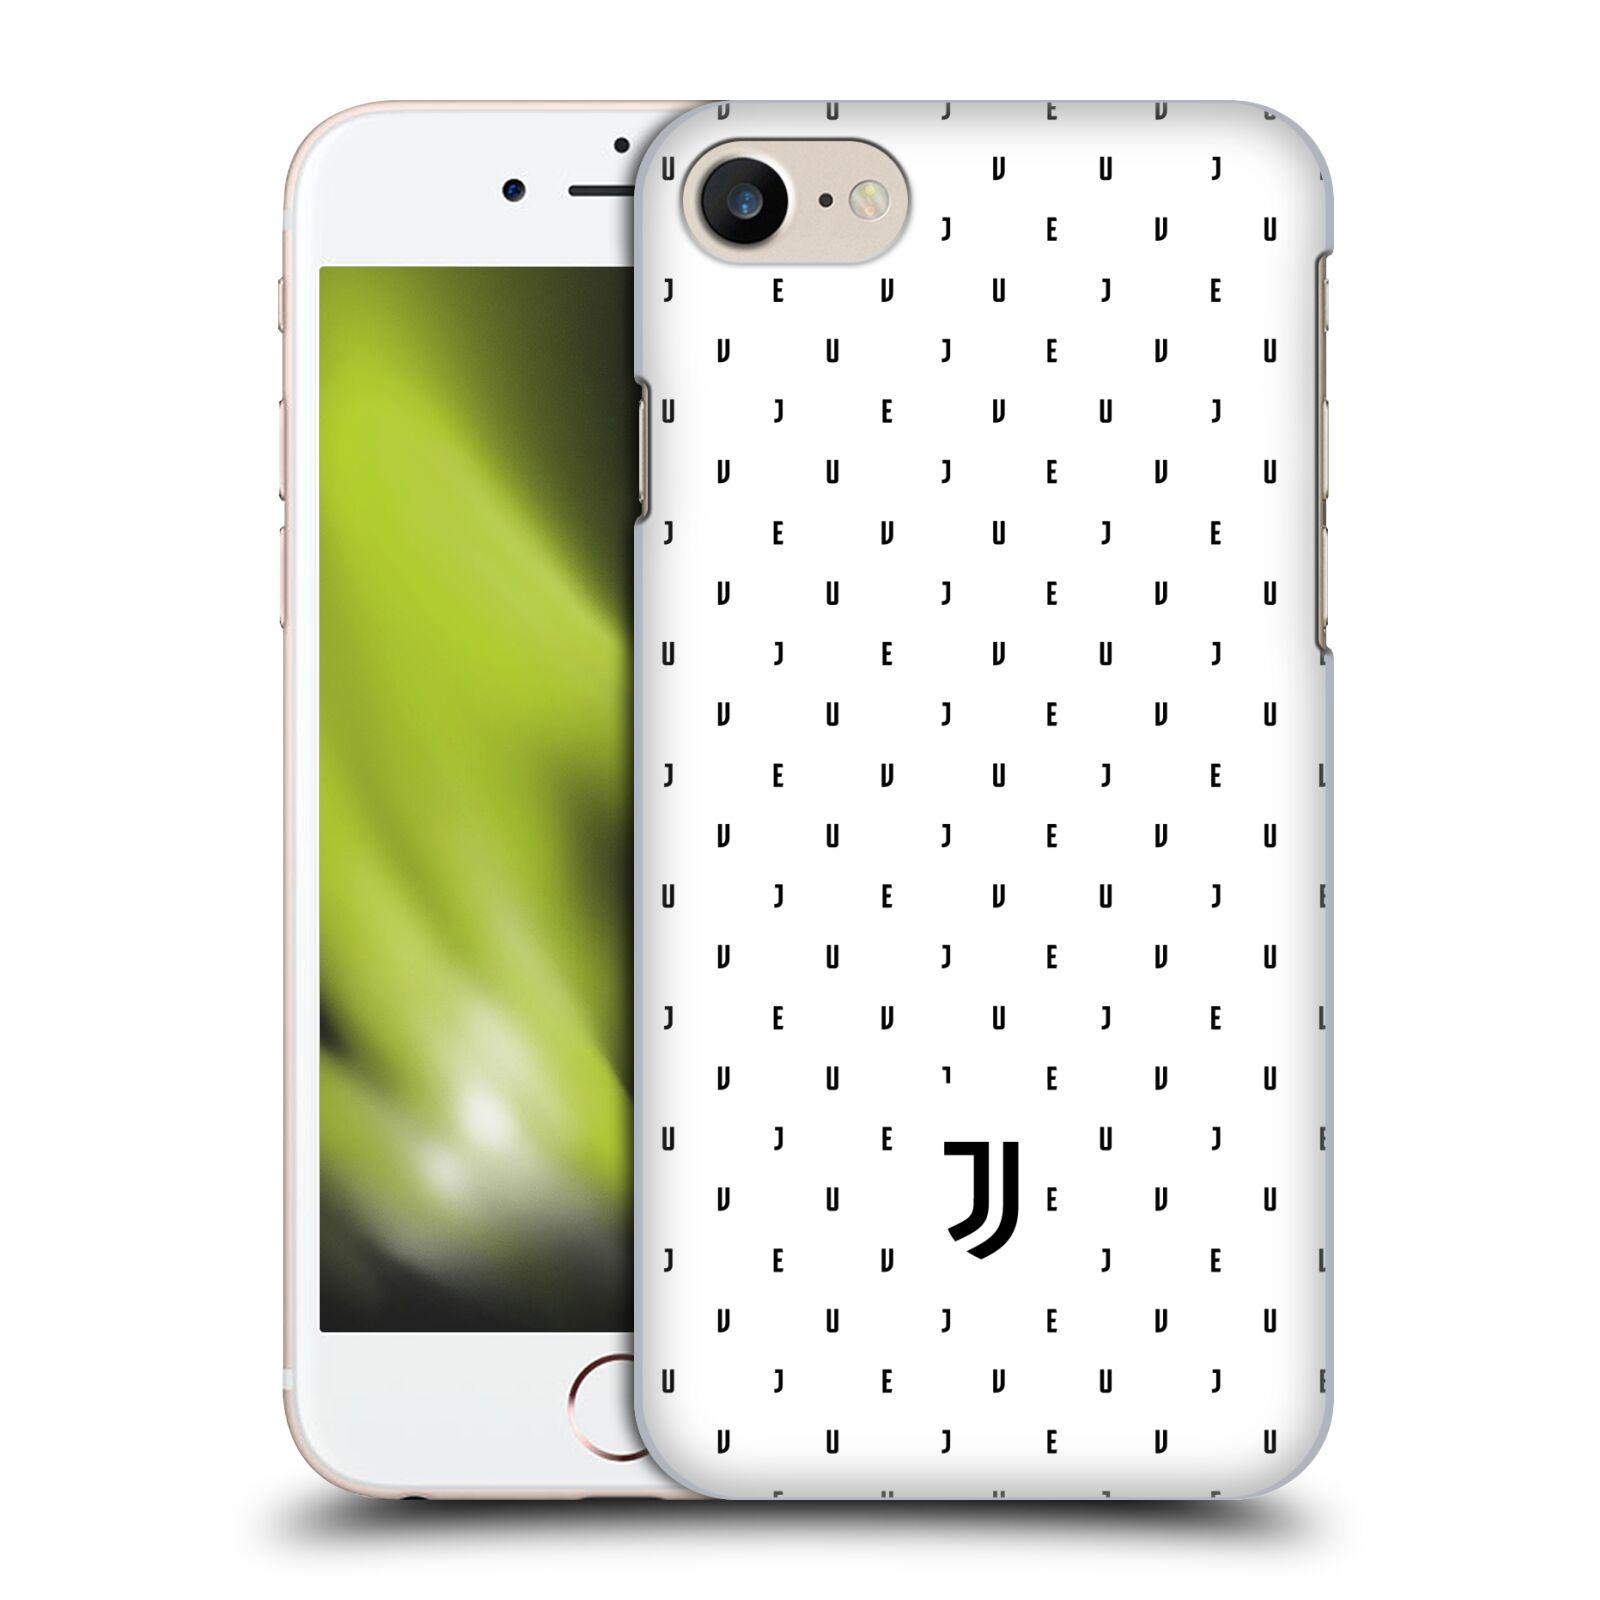 Plastové pouzdro na mobil Apple iPhone SE (2020) - Head Case - Juventus FC - Nové logo - Decentní